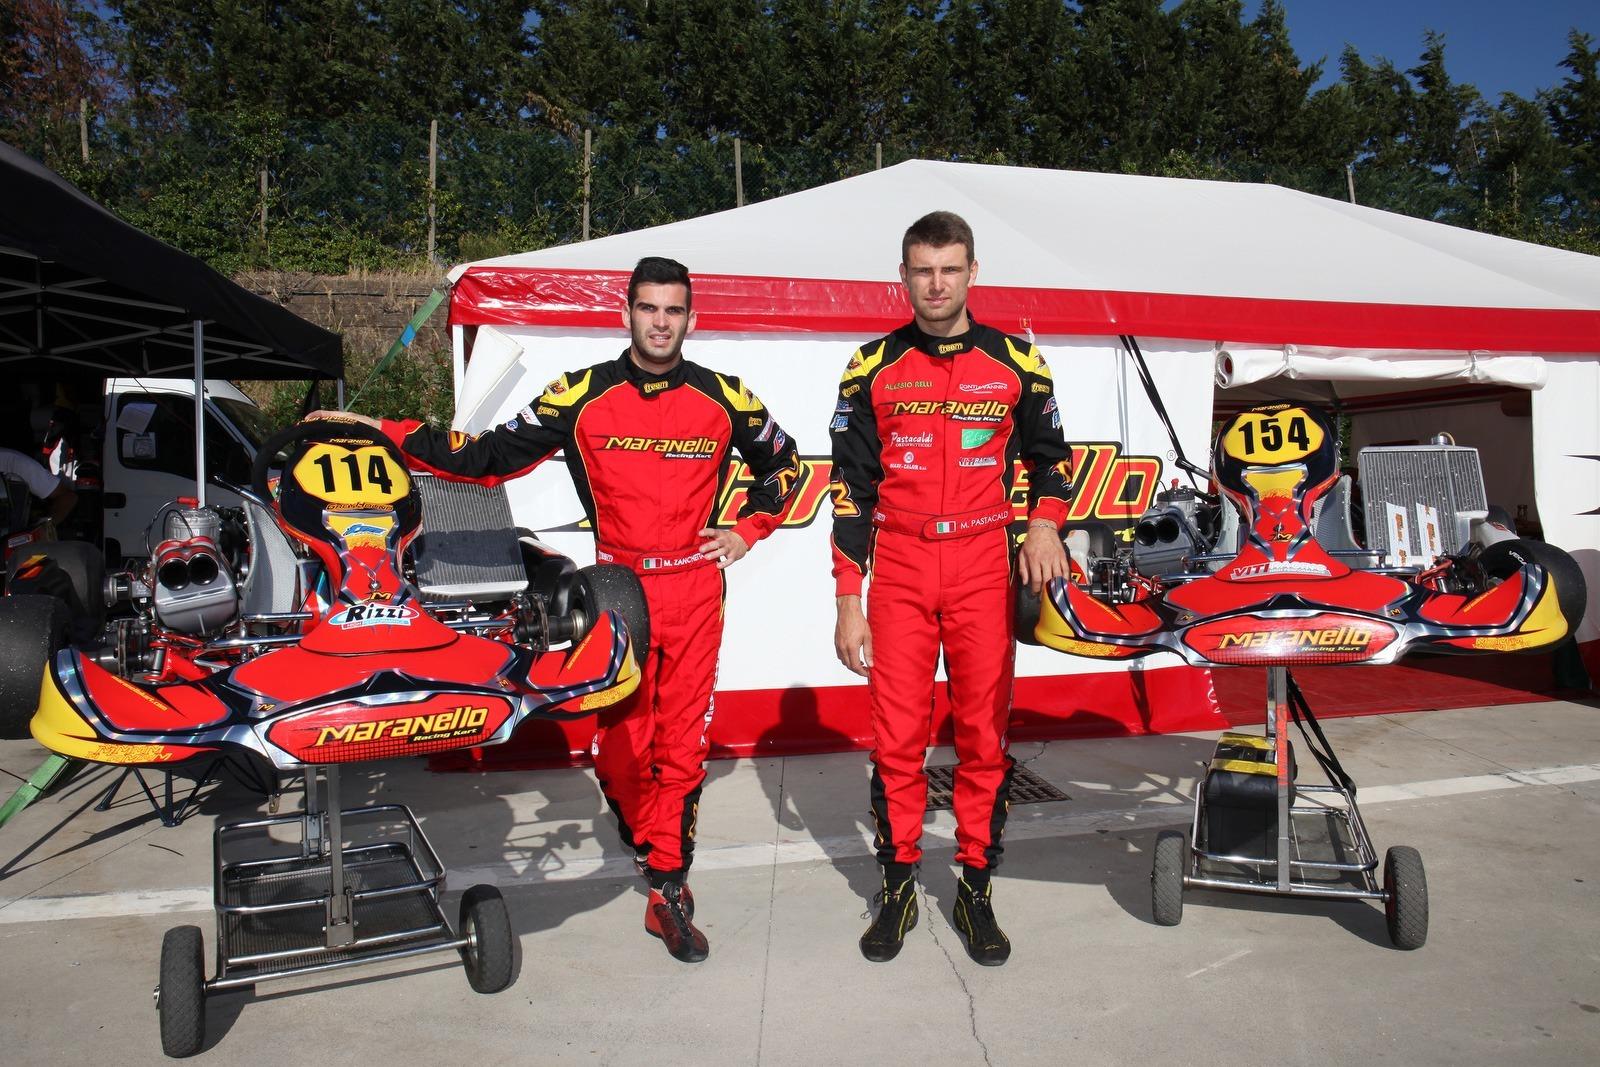 Marco Zanchetta and Marco Pastacaldi, KZ2